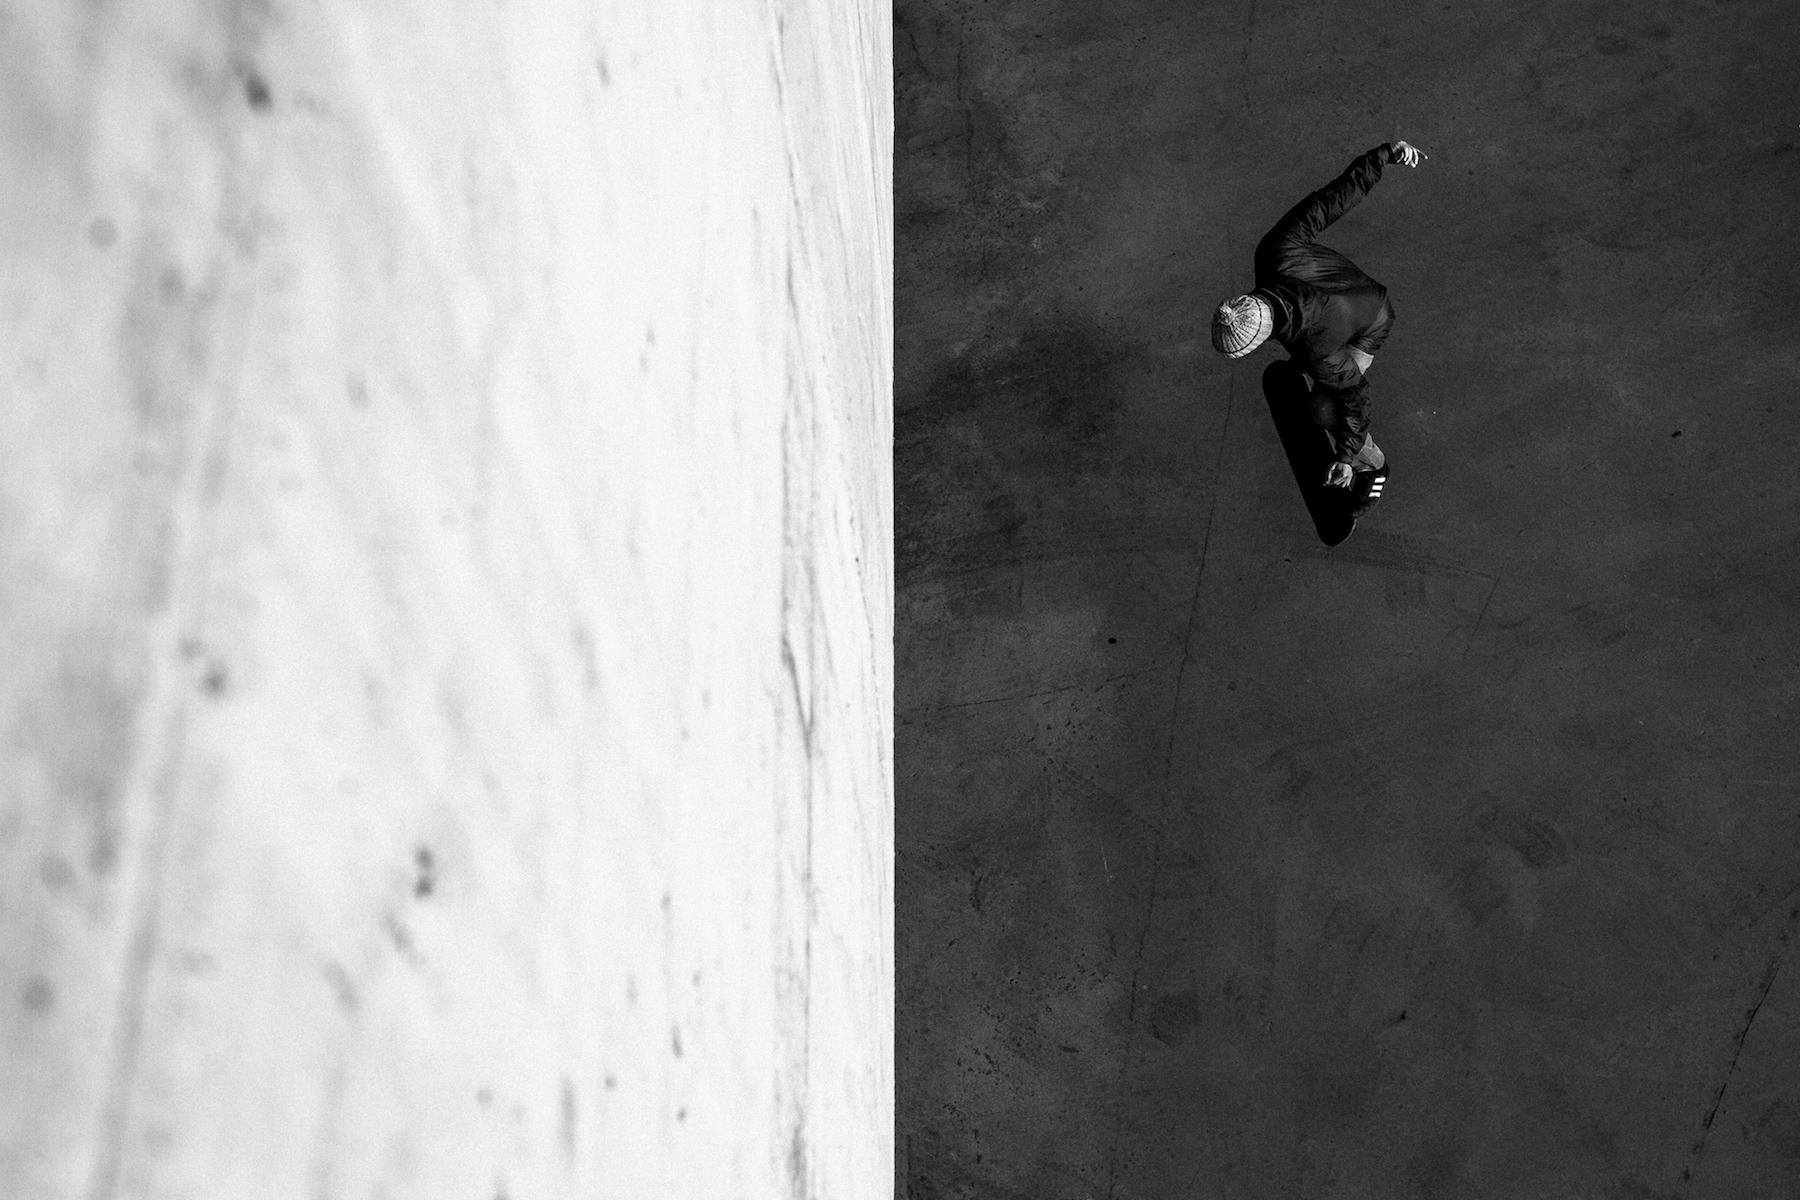 luke-paige-skate-photography-05